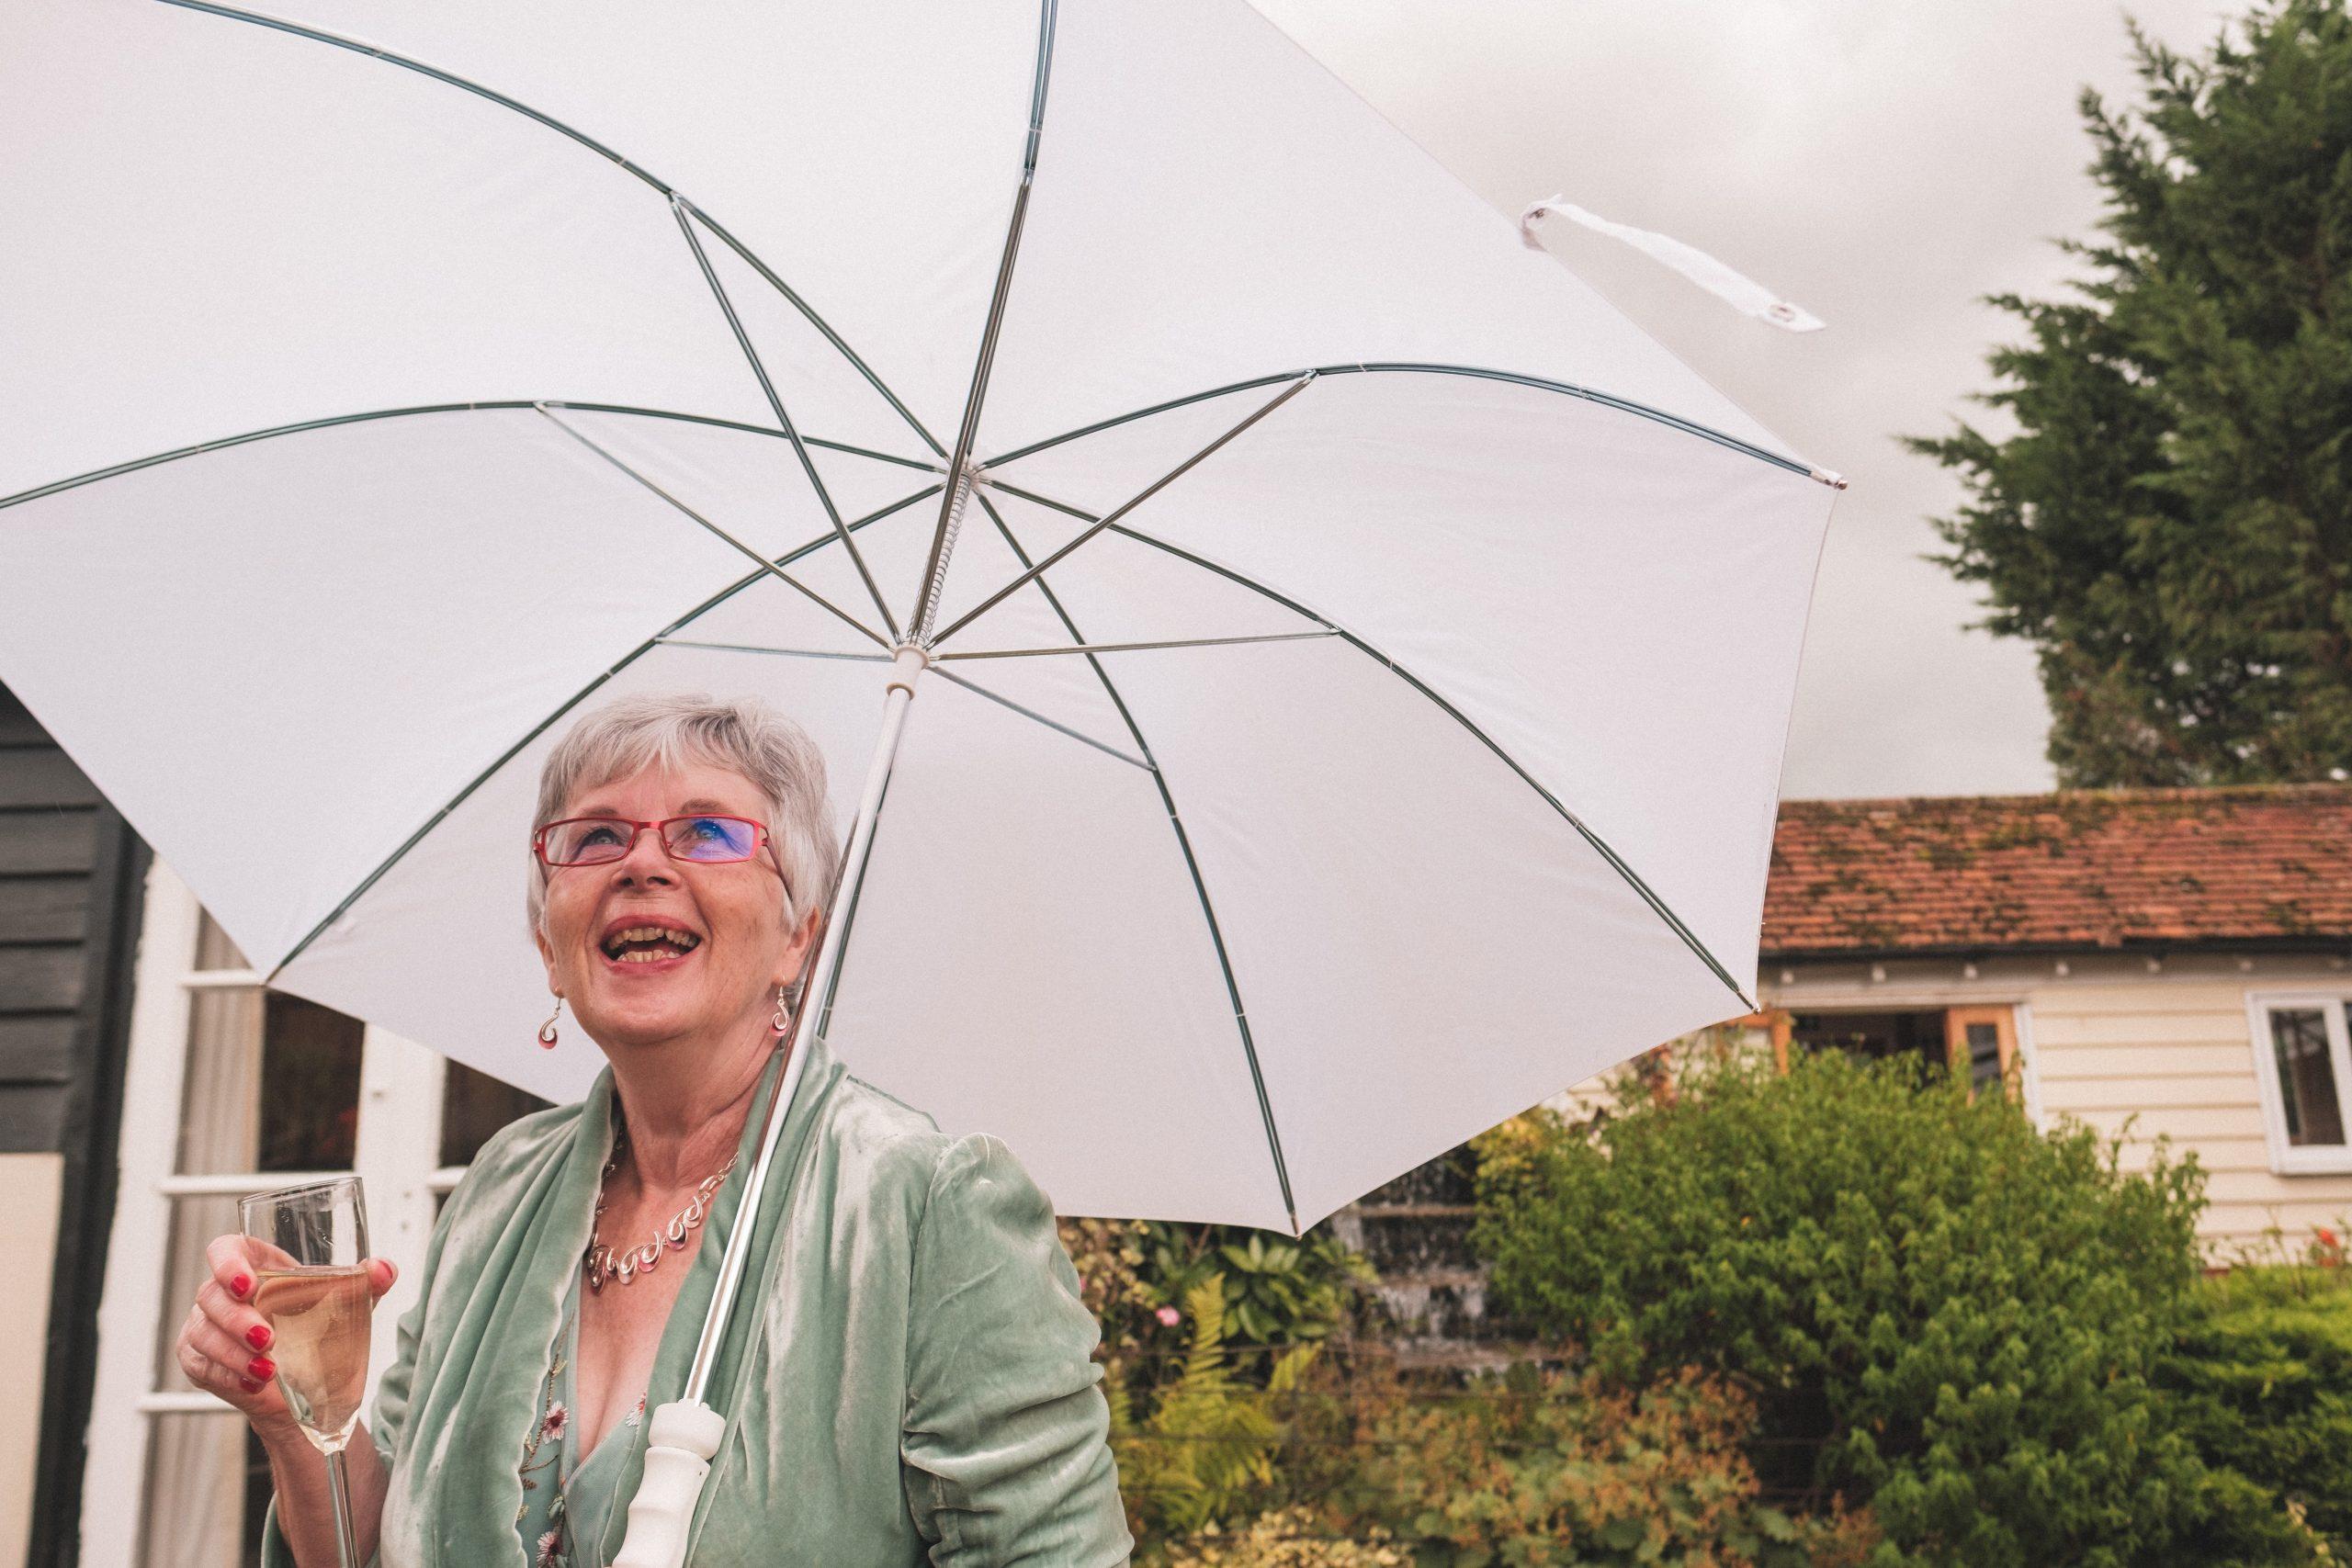 wedding guest with umbrella during a rainy Essex wedding